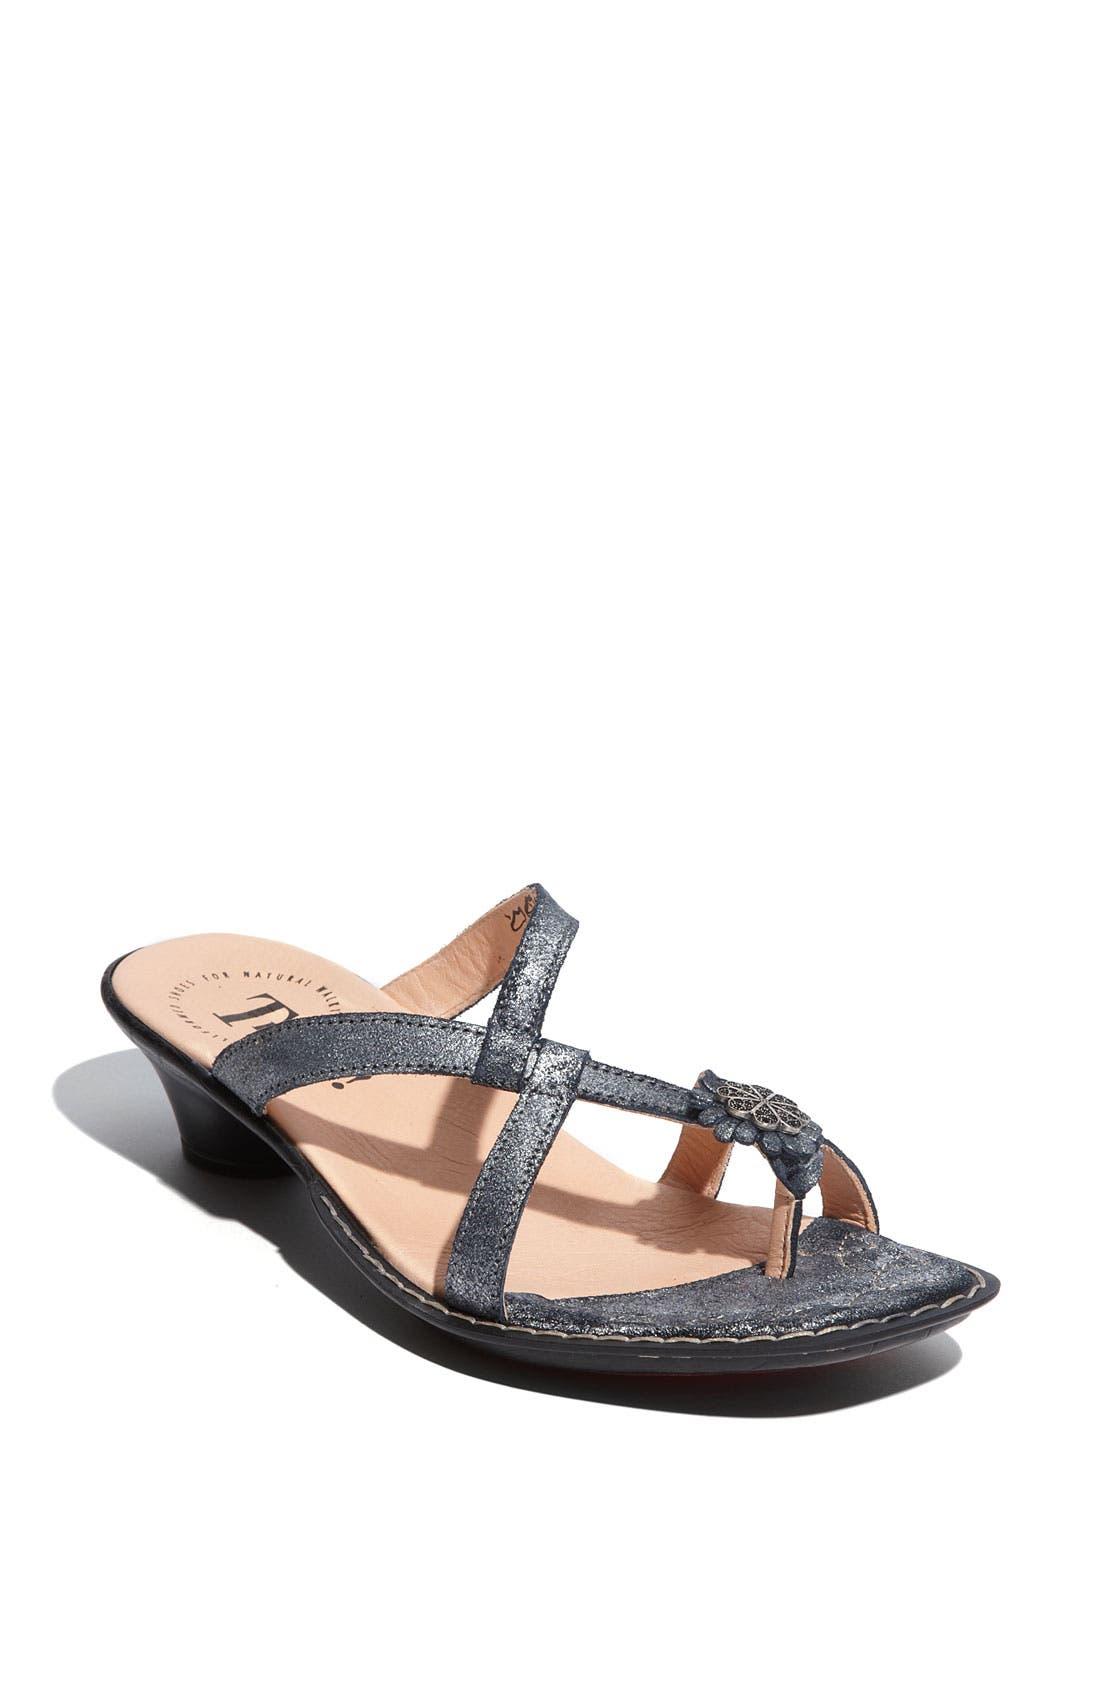 Main Image - Think! 'Soso' Metallic Leather Sandal